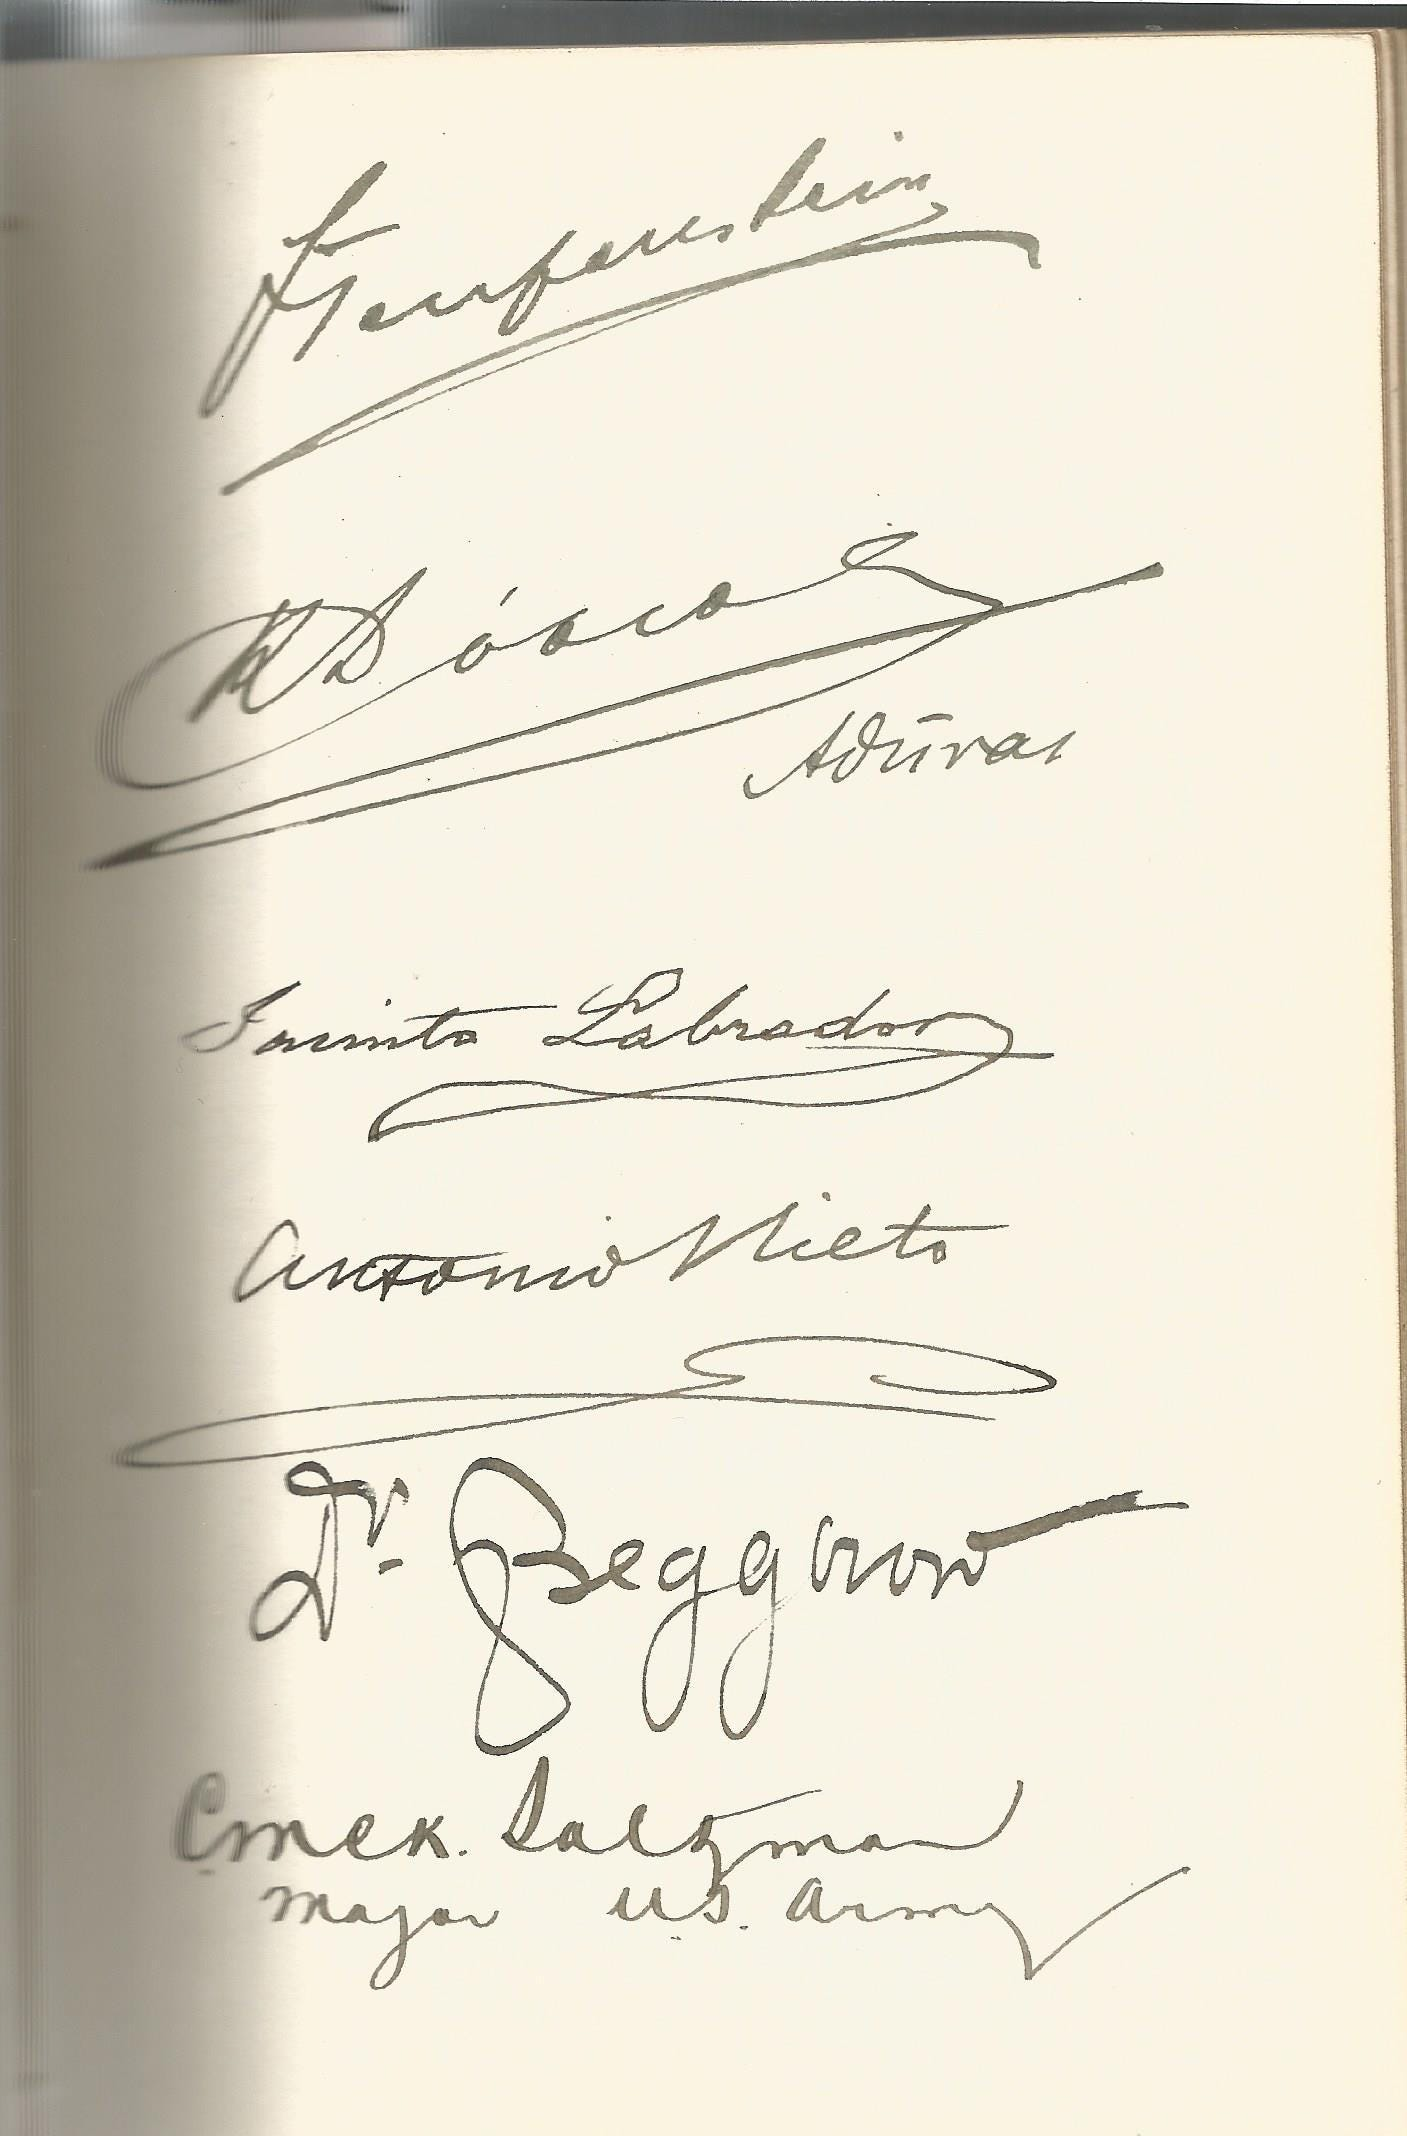 Guglielmo Marconi multiple signed International Radio Telegraph Conference London 1912 vintage - Image 2 of 5